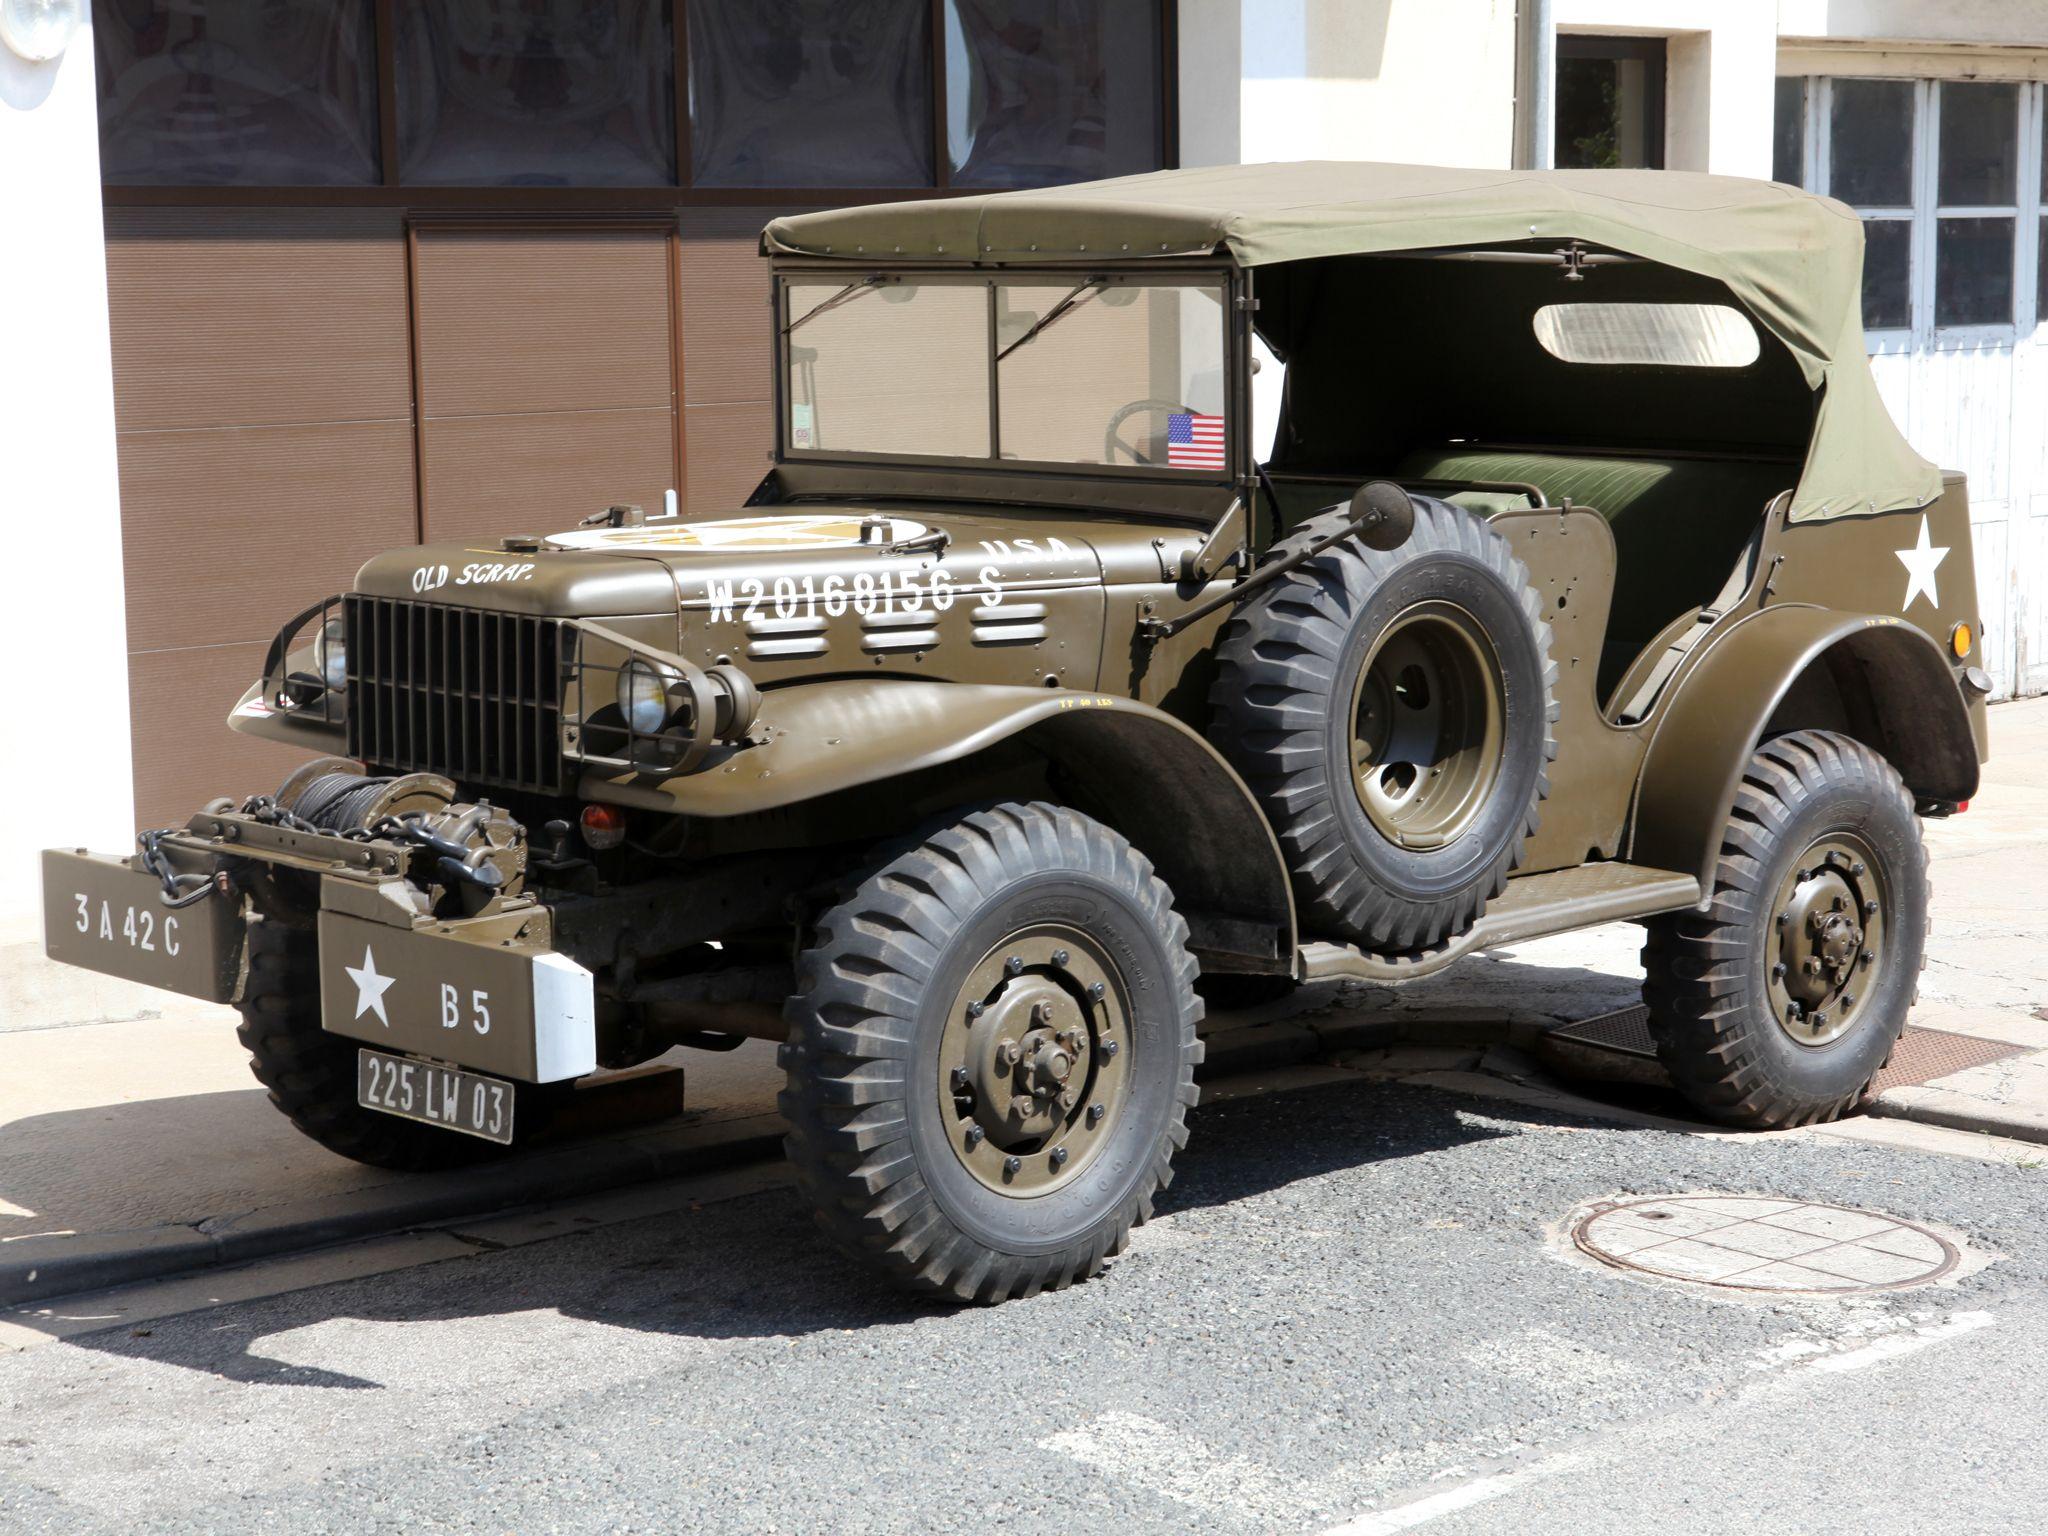 dodge wc 57 command car 1942 44, a classic! beep, beep goes mydodge wc 57 command car 1942 44, a classic!